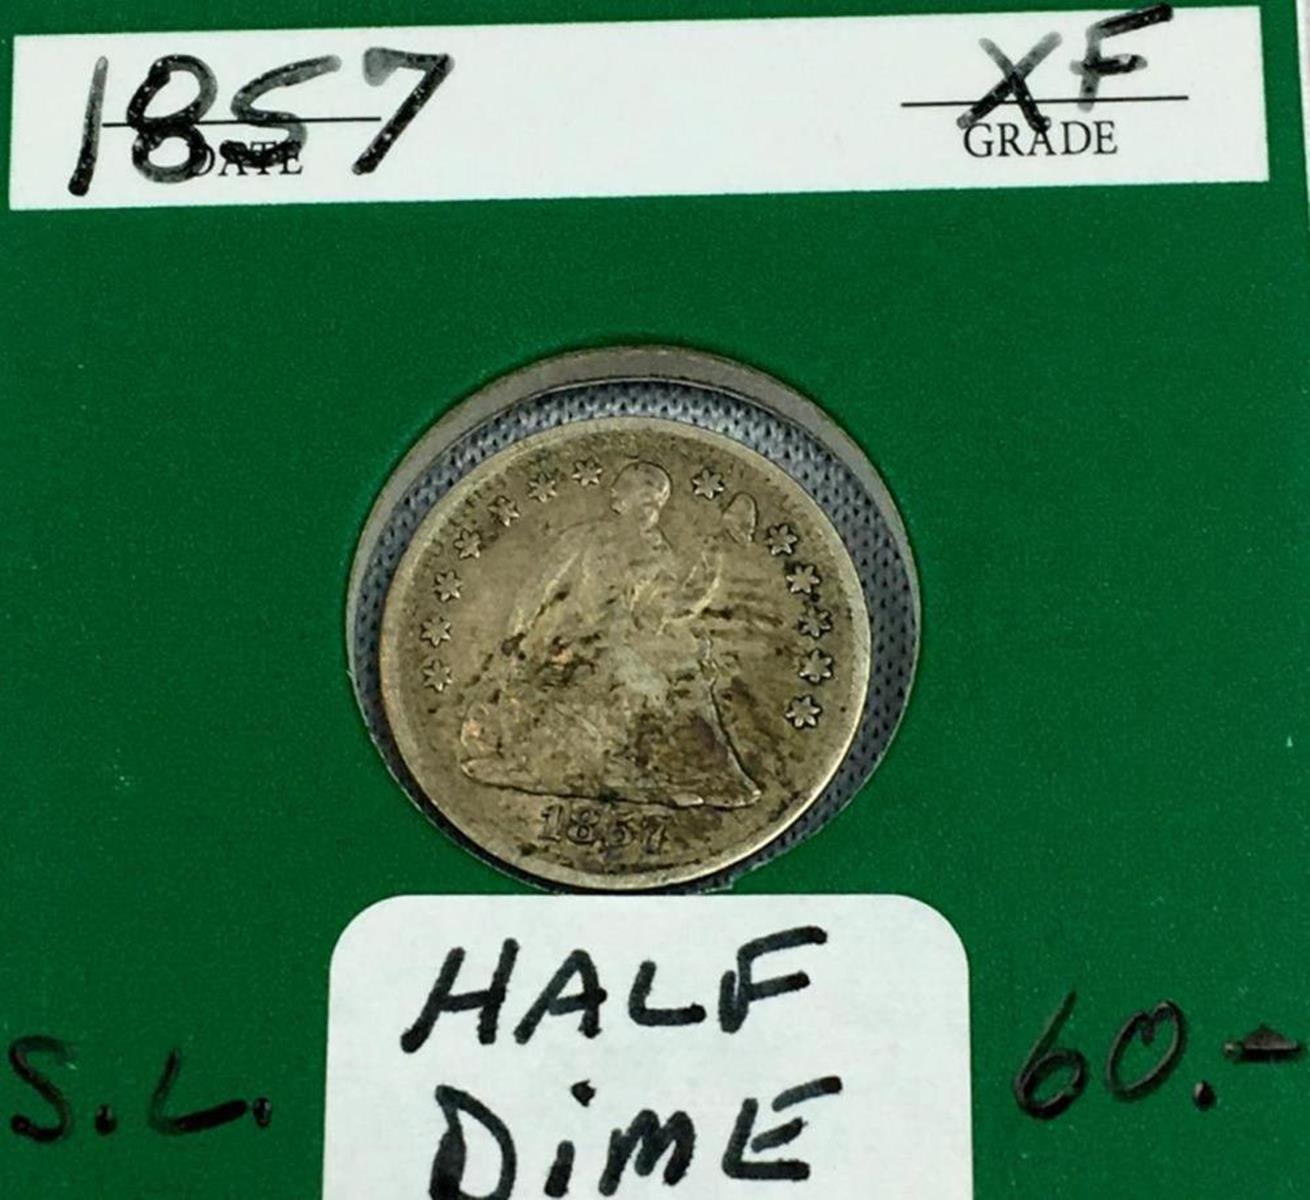 1857 US 5c Seated Liberty Silver Half Dime w/ Case